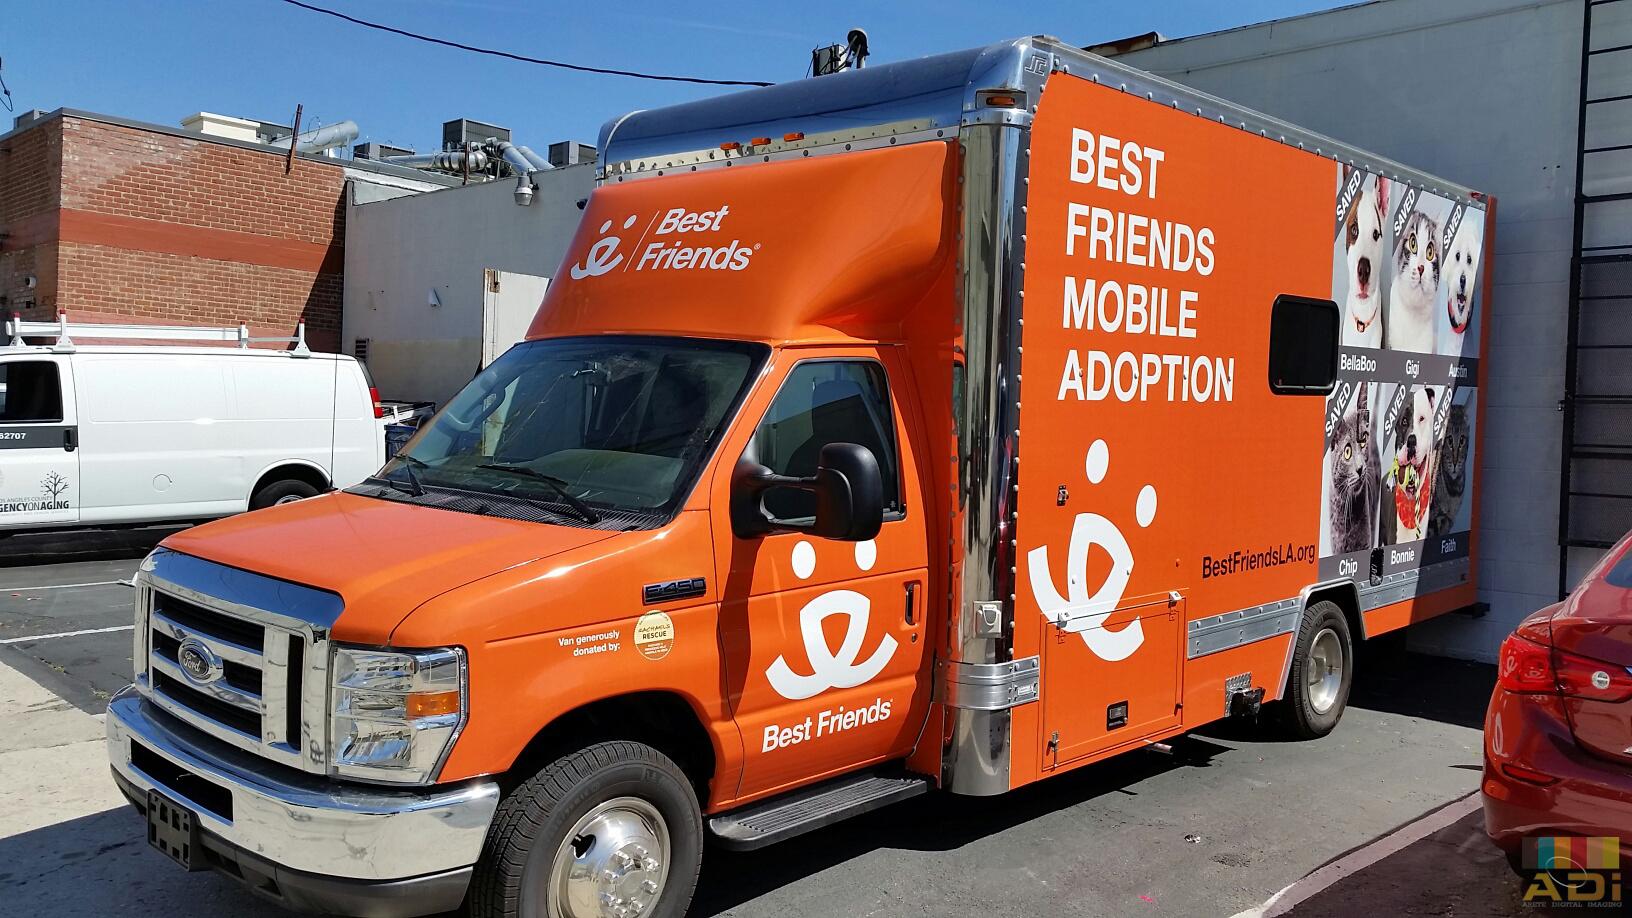 Best friends mobile adoption Truck Wrap